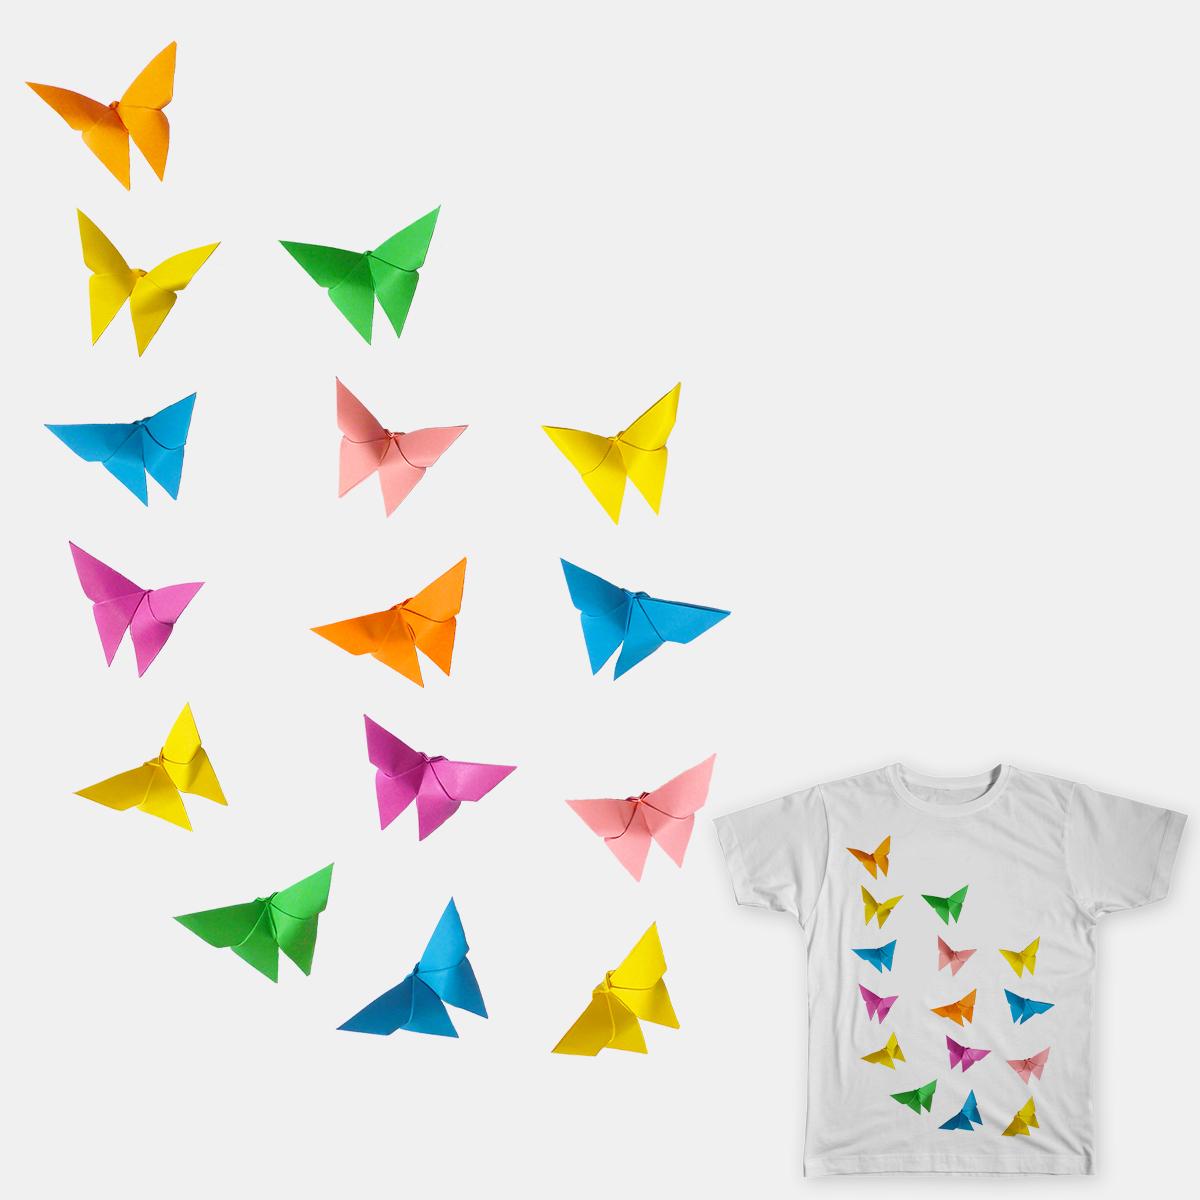 Origami Butterflies by -Mariska on Threadless